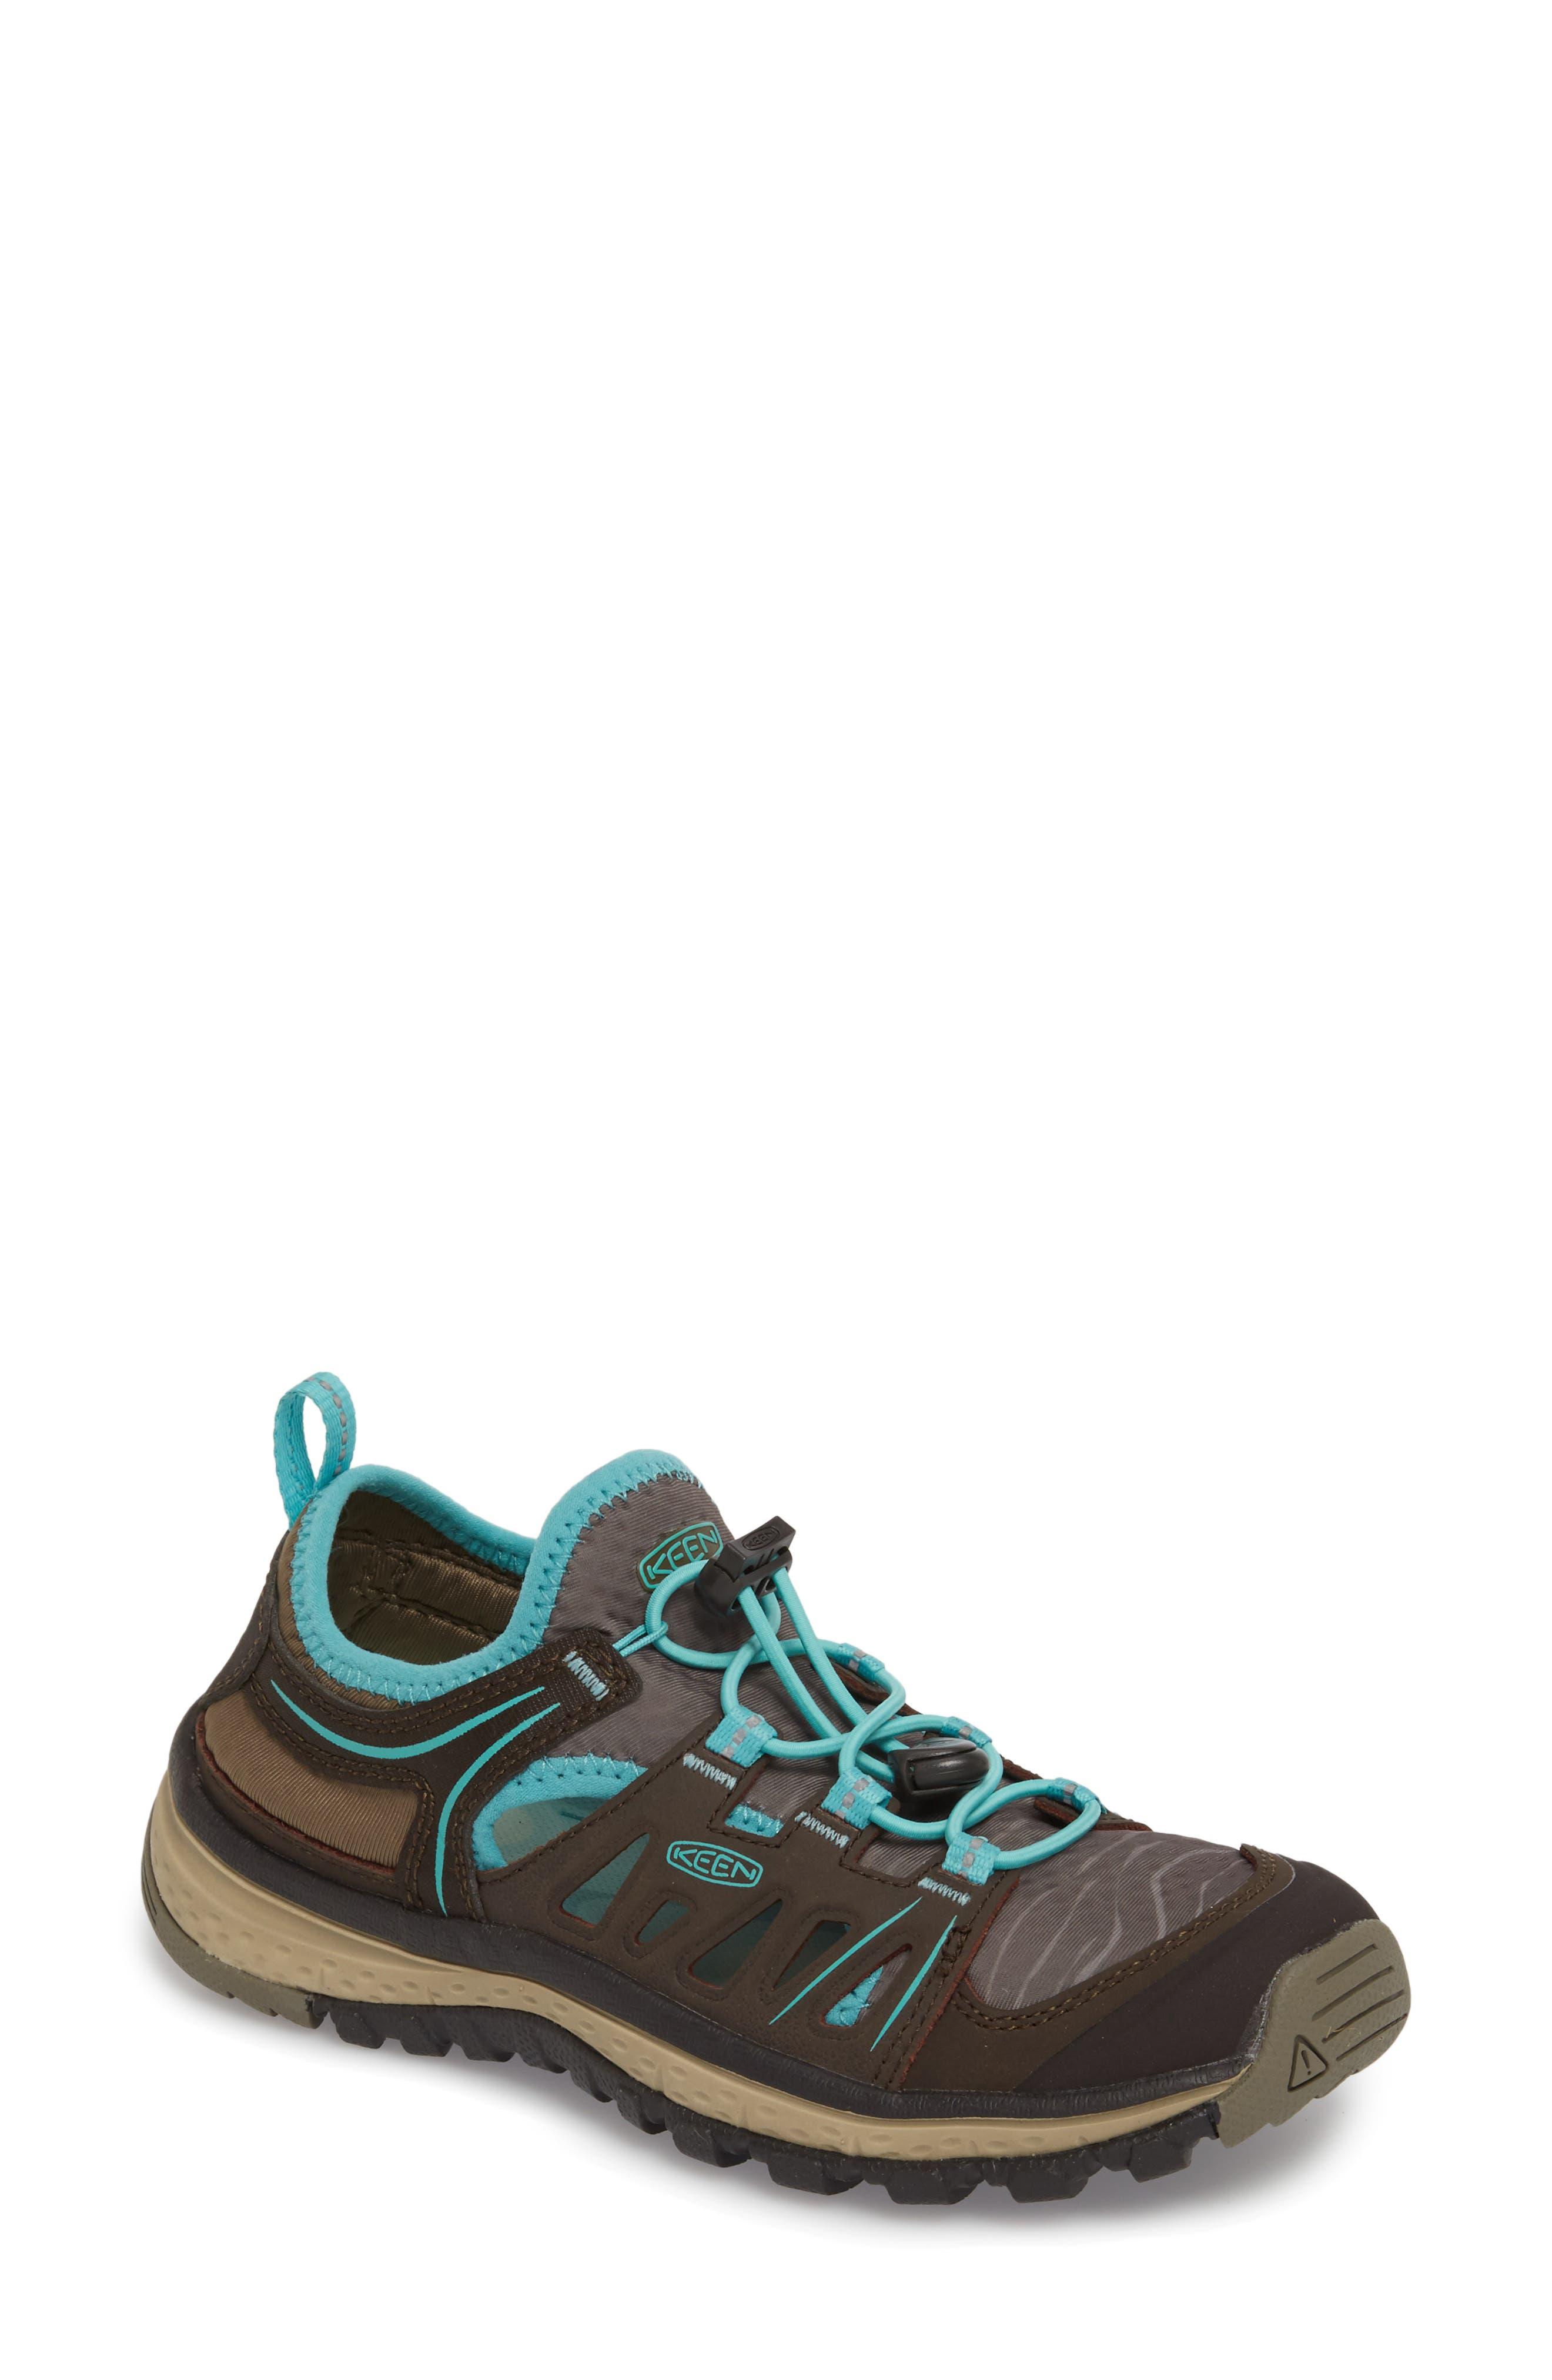 Main Image - Keen Terradora Ethos Hiking Sneaker (Women)